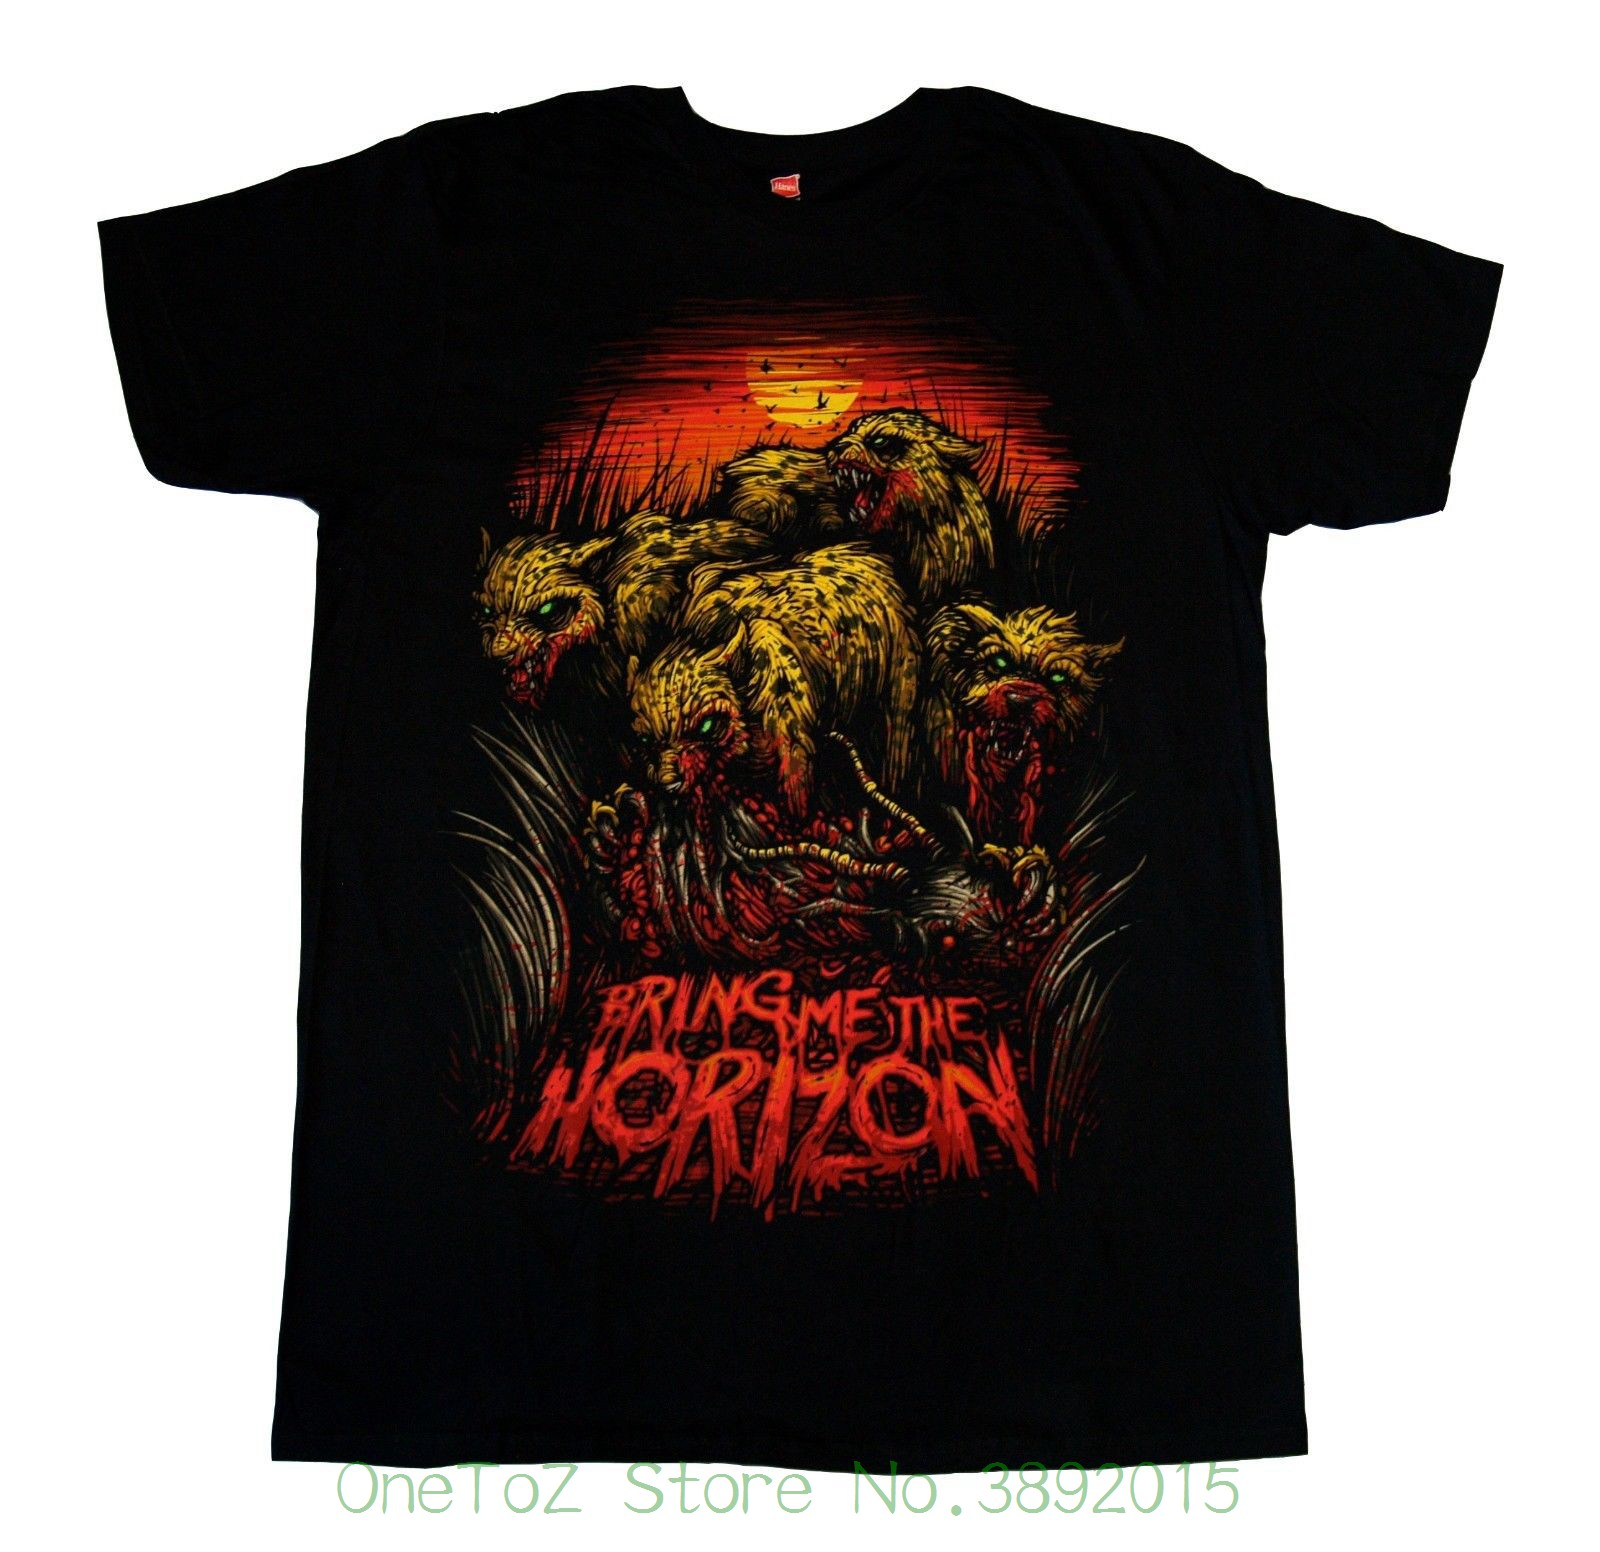 Print Tee Men Short Sleeve Clothing Bring Me The Horizon - Cheetah - T Shirt S , M , L , Xl , 2xl New - Official Merchandise